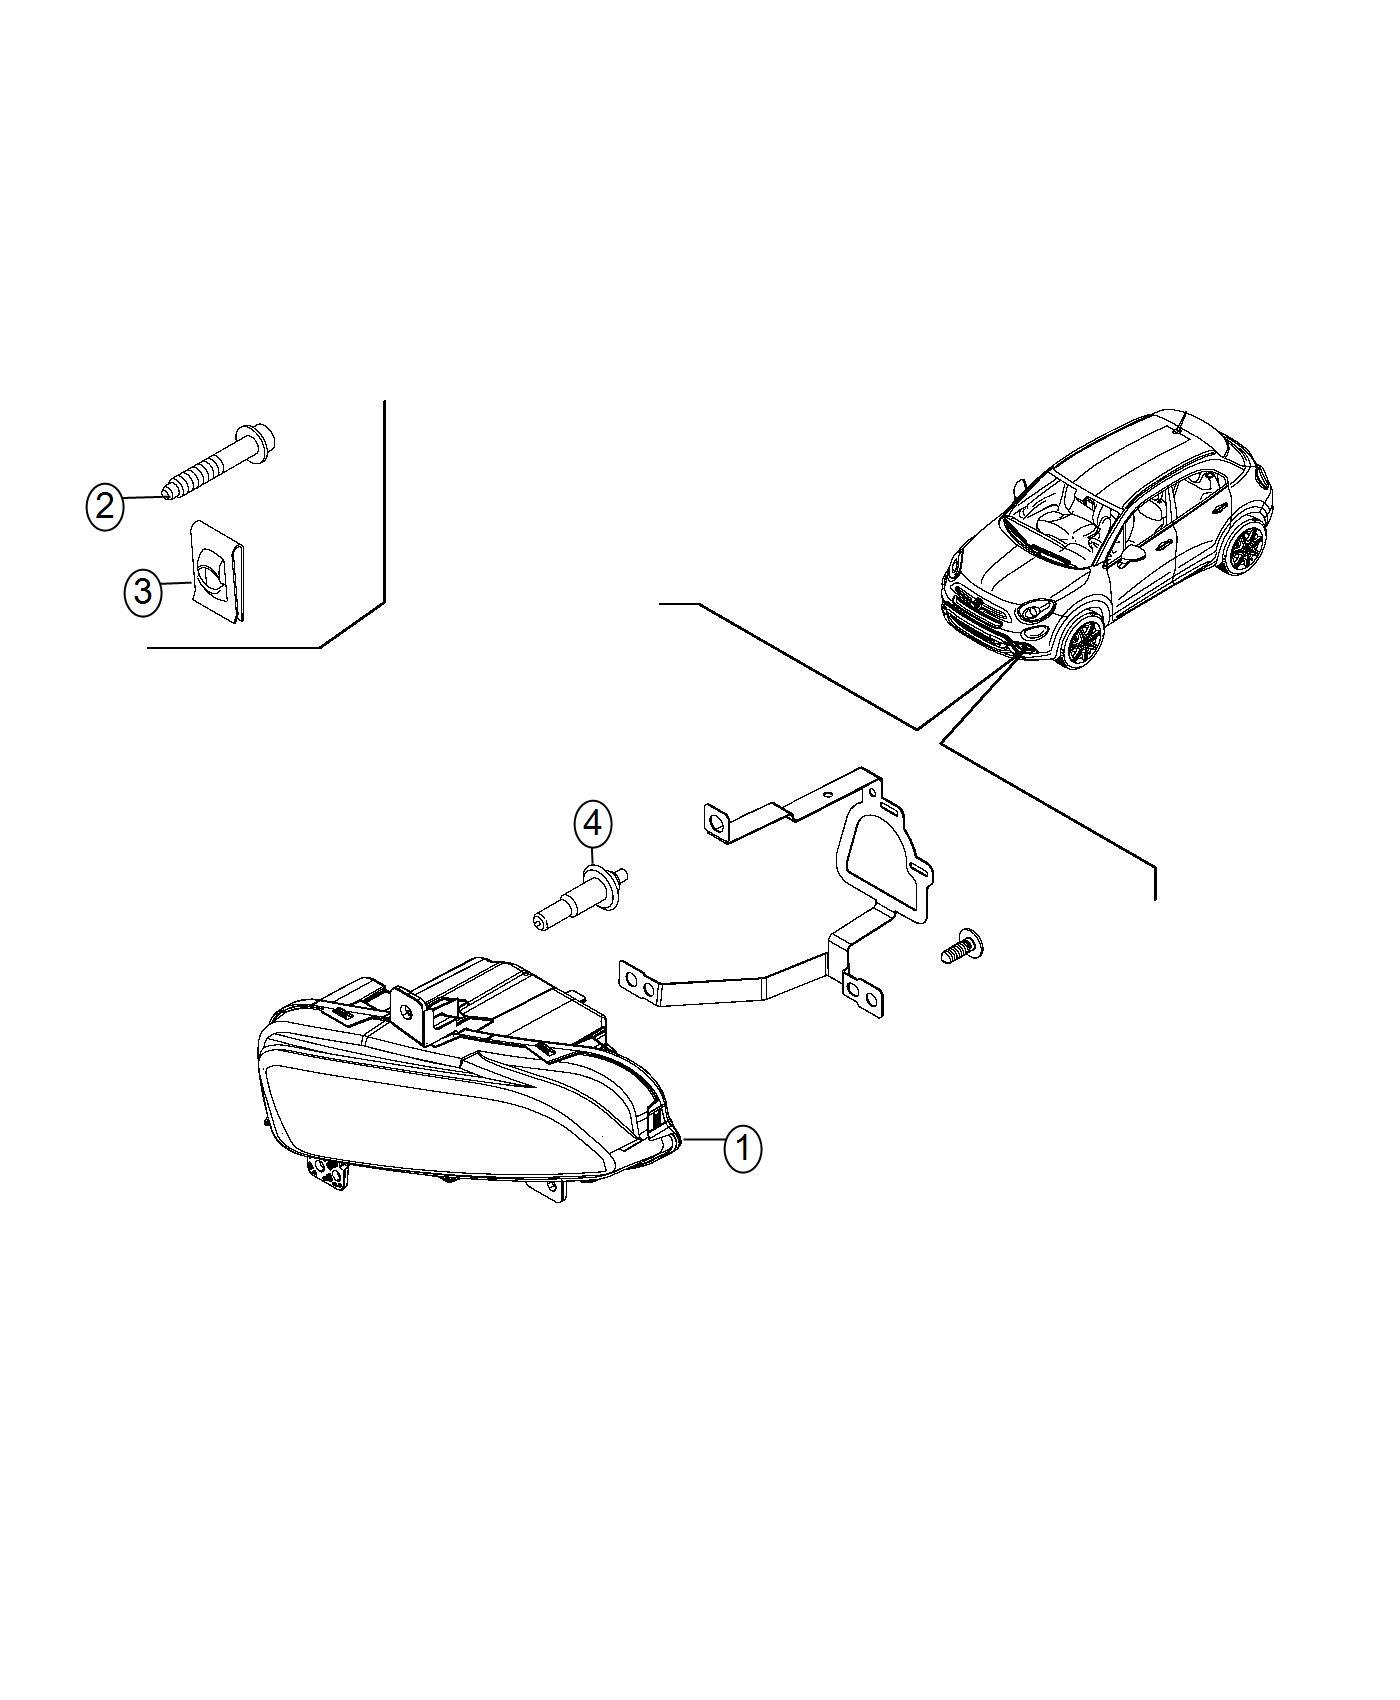 2016 Fiat 500X Bulb. Export. Maintenance, bulbs